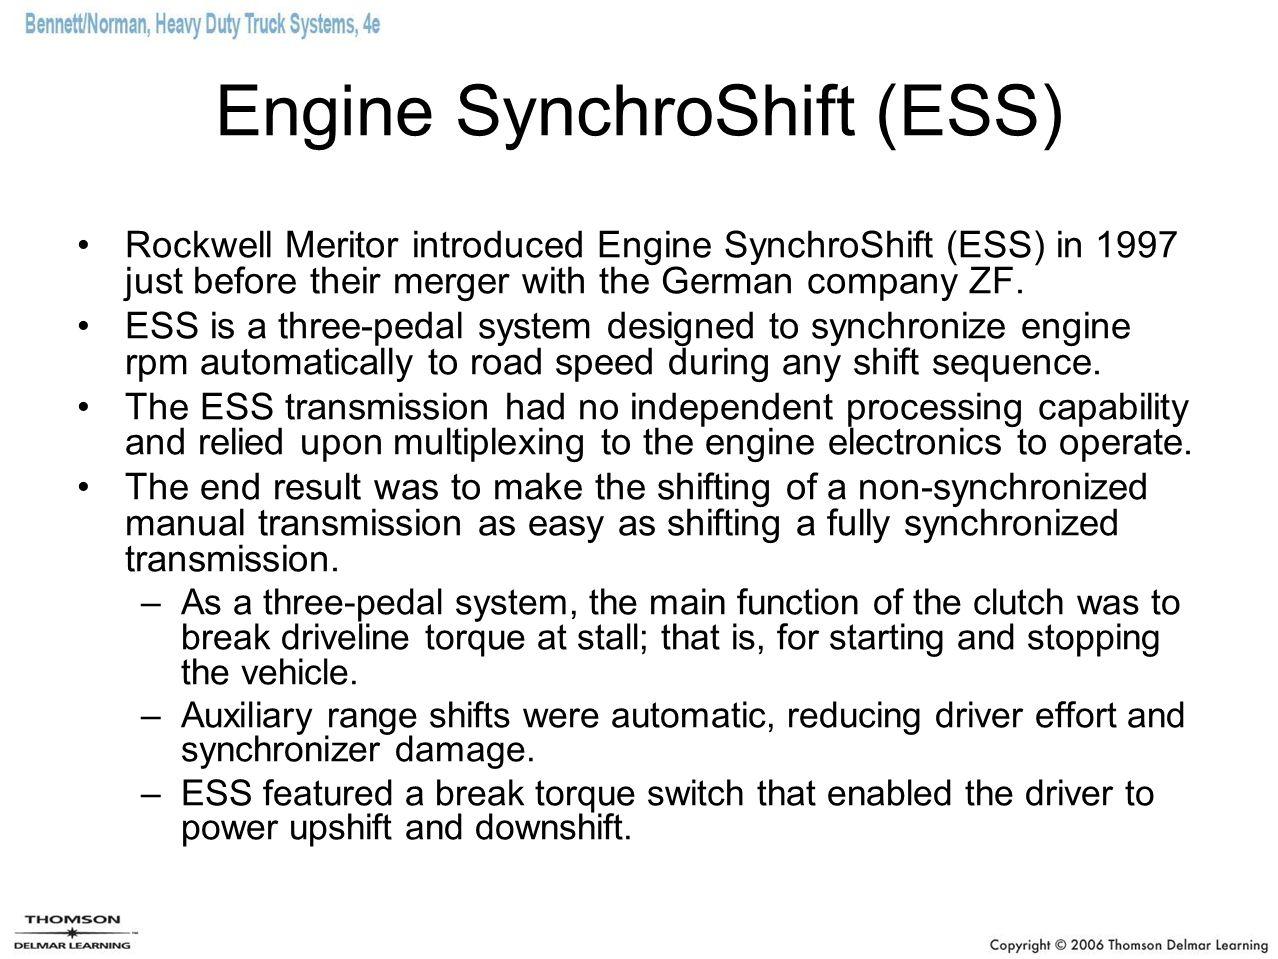 Engine SynchroShift (ESS)